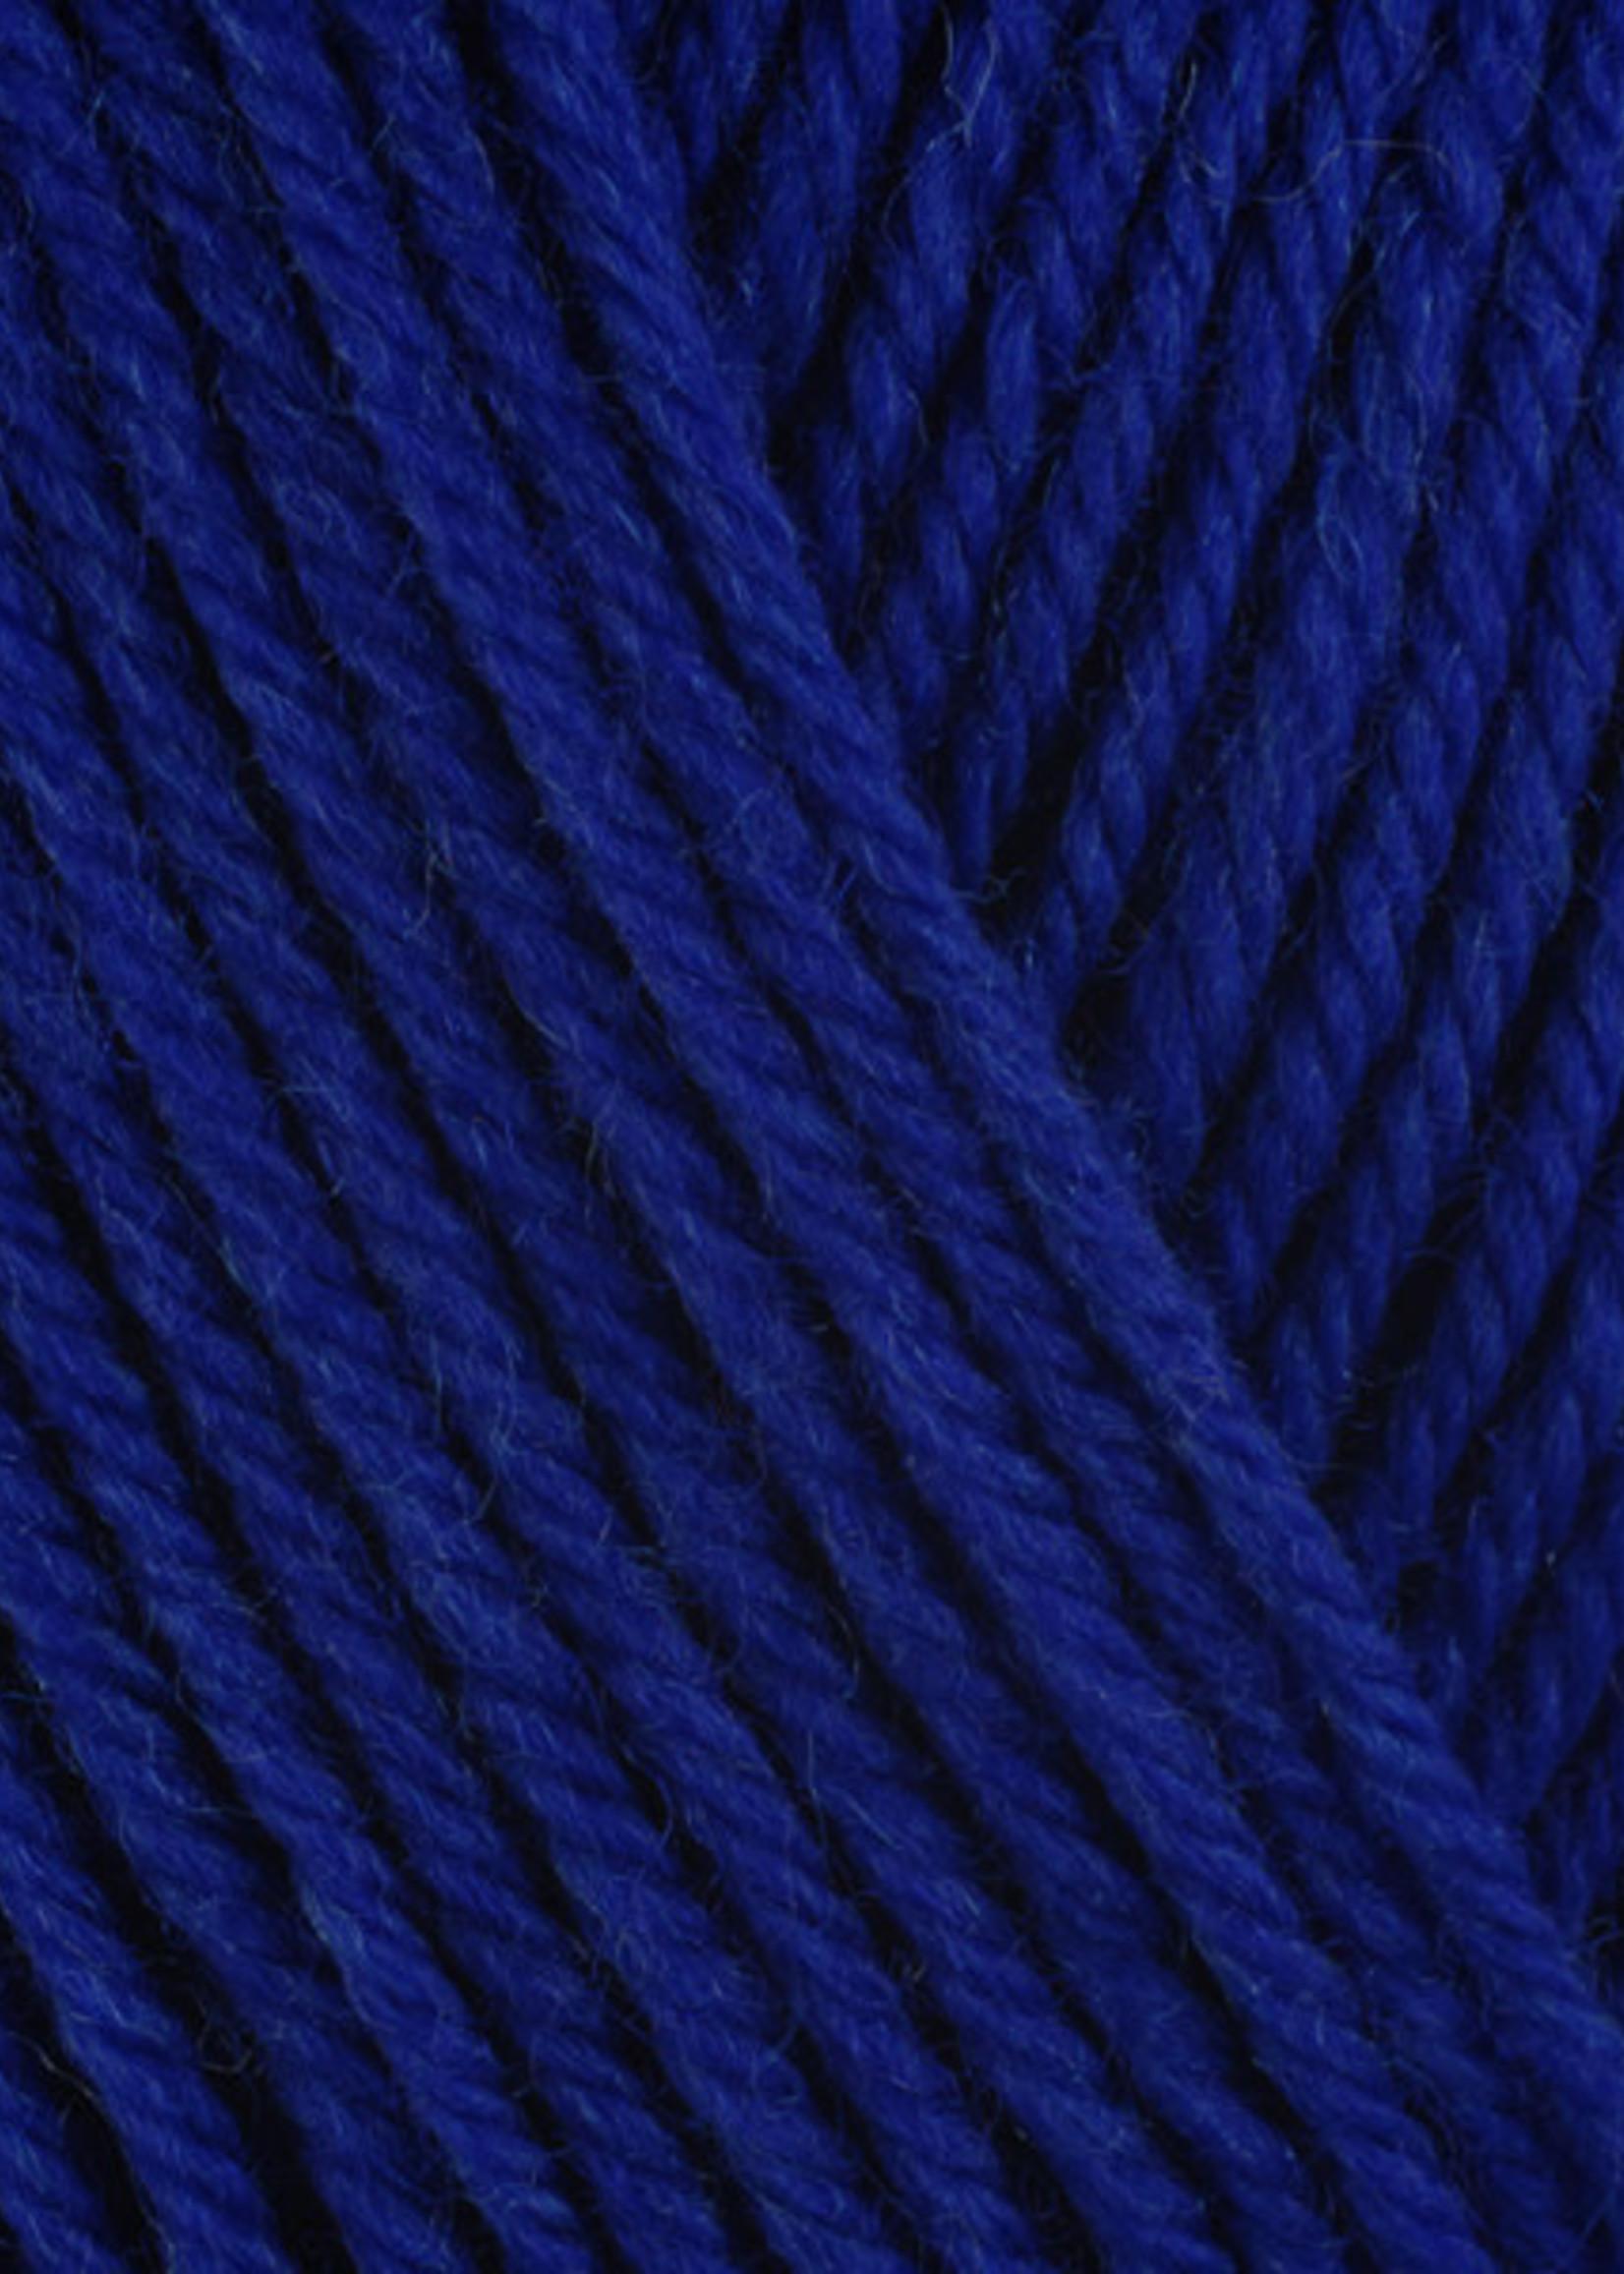 Berroco Berroco Ultra Wool 33156 Cobalt